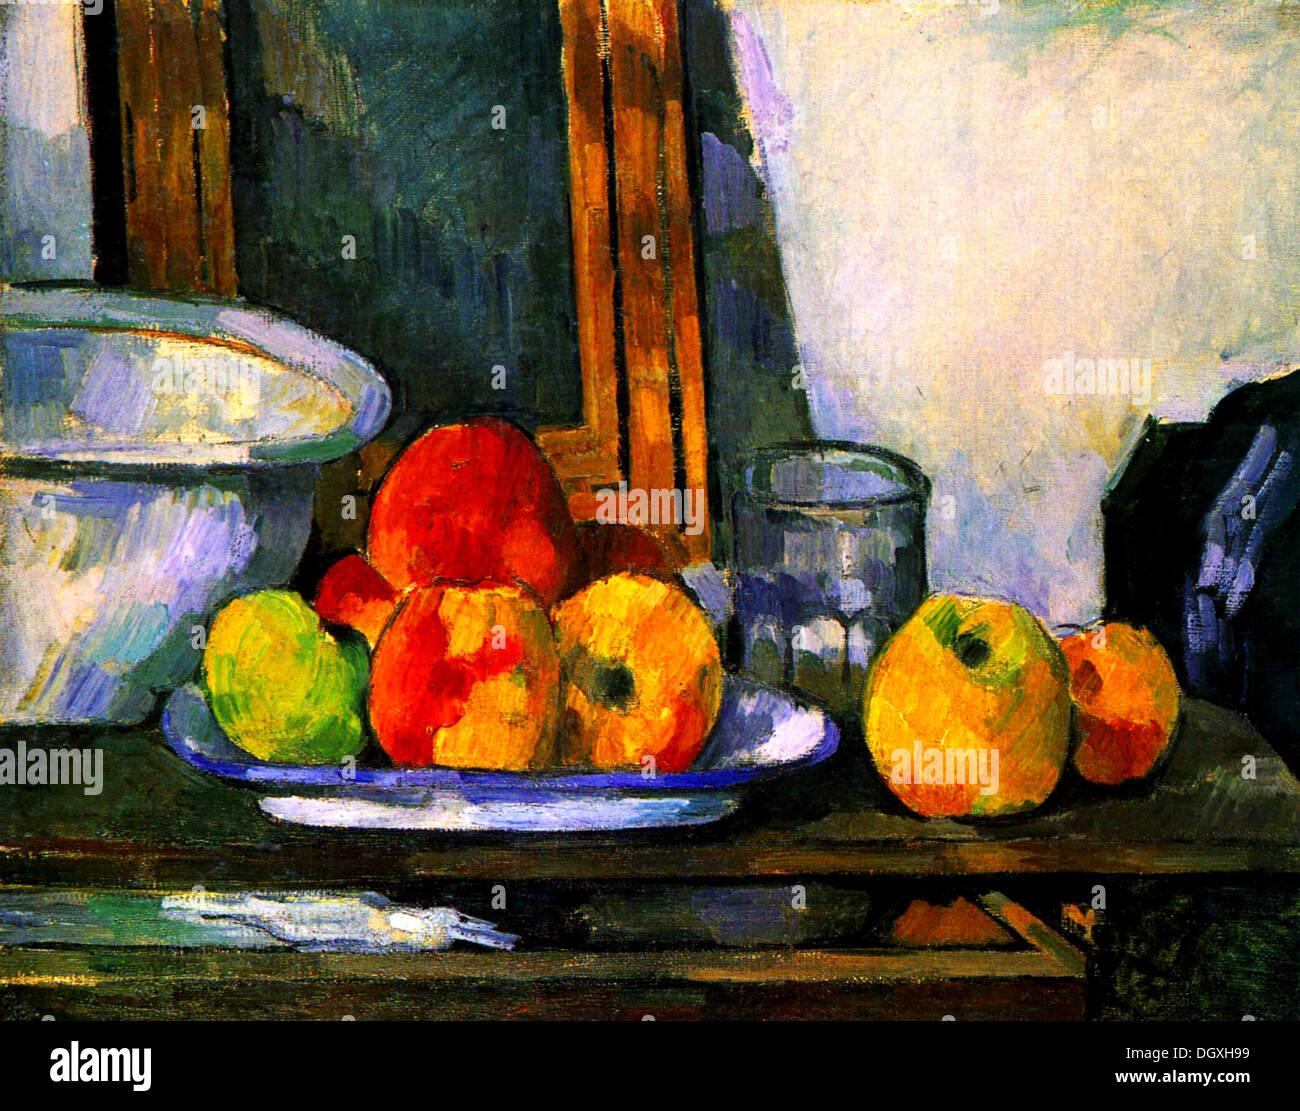 Bodegón con un cajón abierto - por Paul Cézanne, 1879 Imagen De Stock